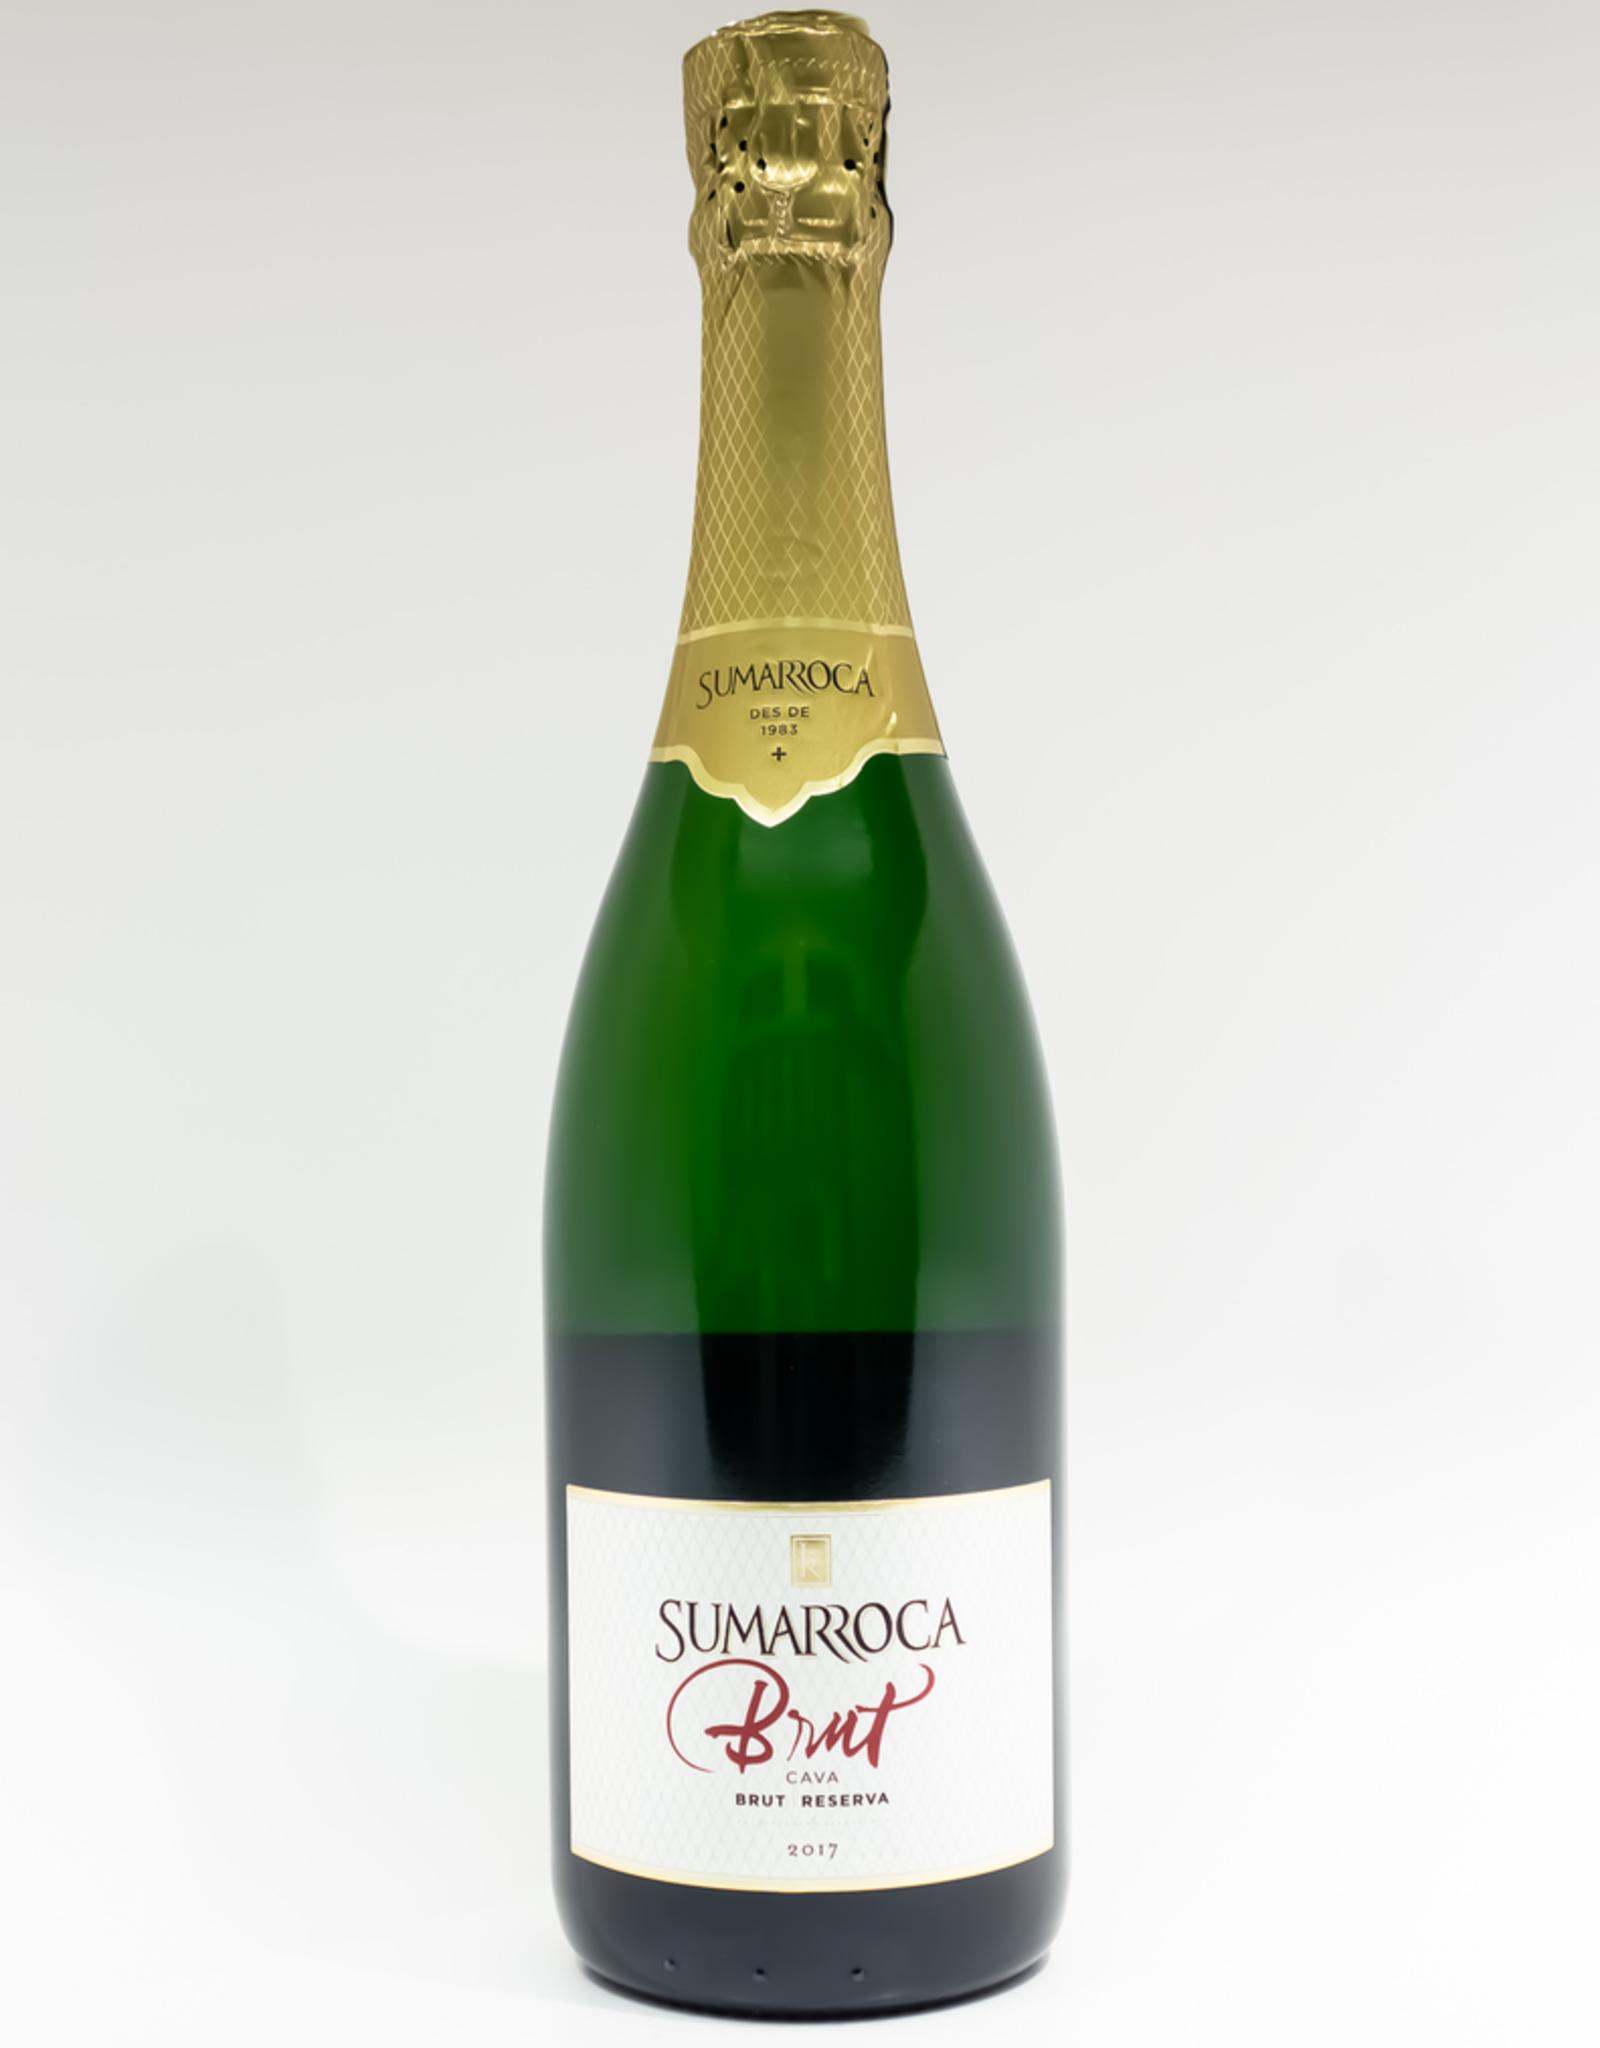 Wine-Sparkling-Cava Bodegues Sumarroca Cava DO Brut Reserva 2017